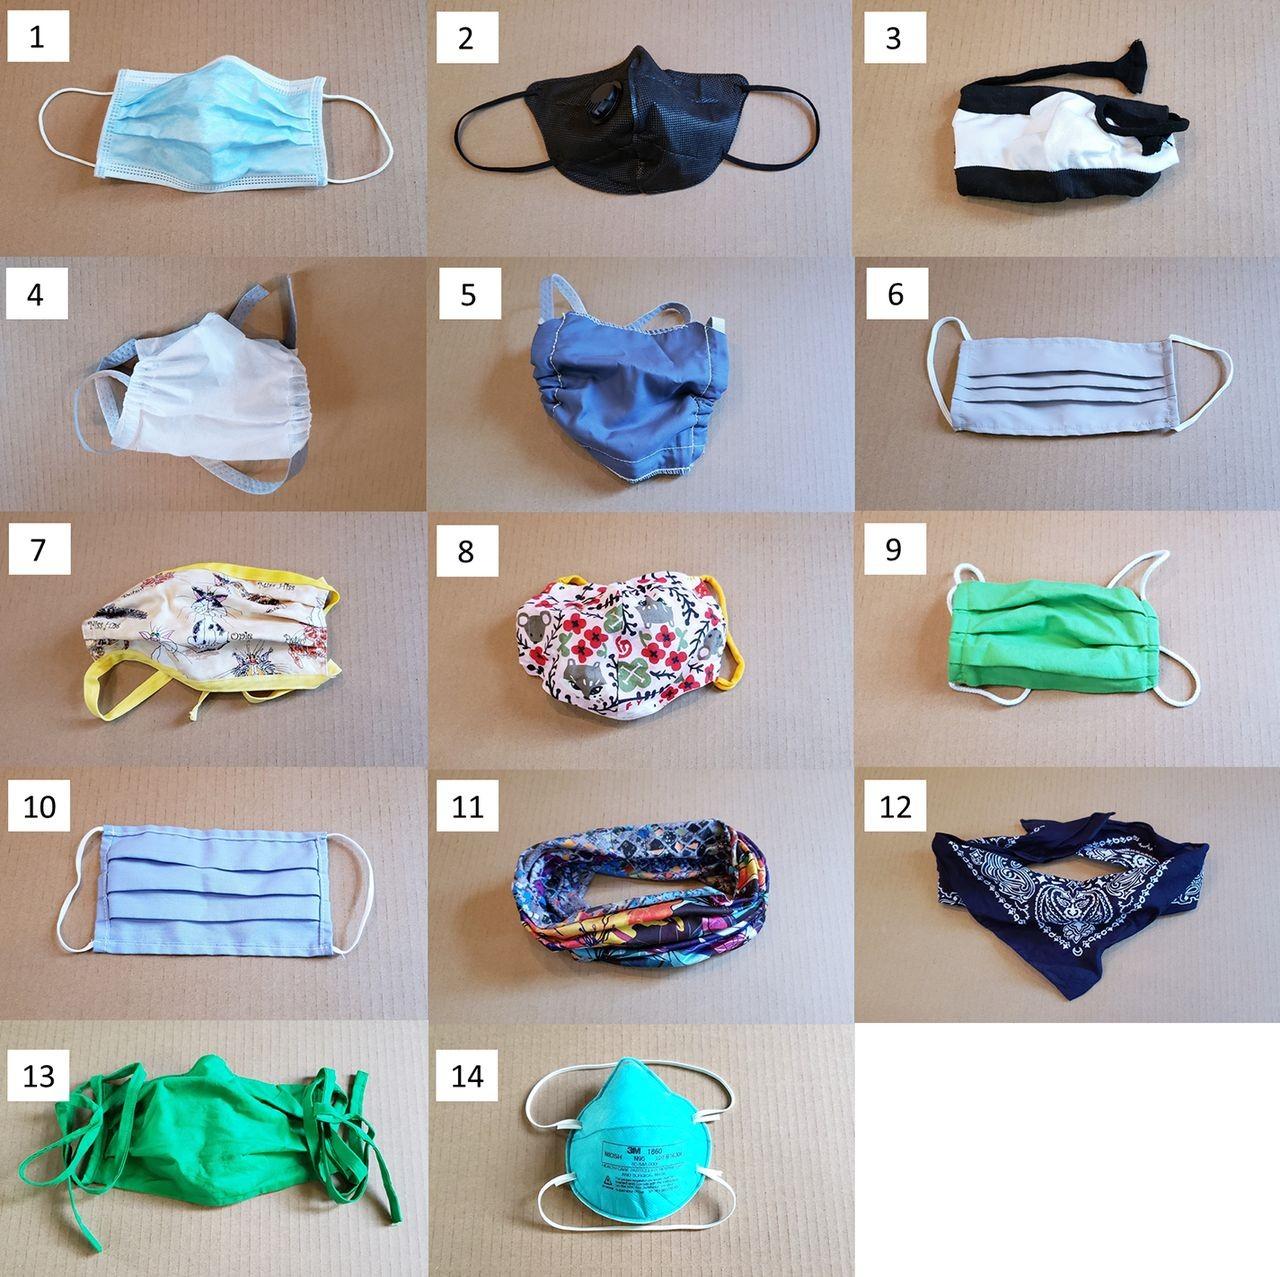 Os cientistas da Universidade Duke testaram 14 tipos de máscaras ou modelos alternativos (Foto: Emma Fischer, Duke University)